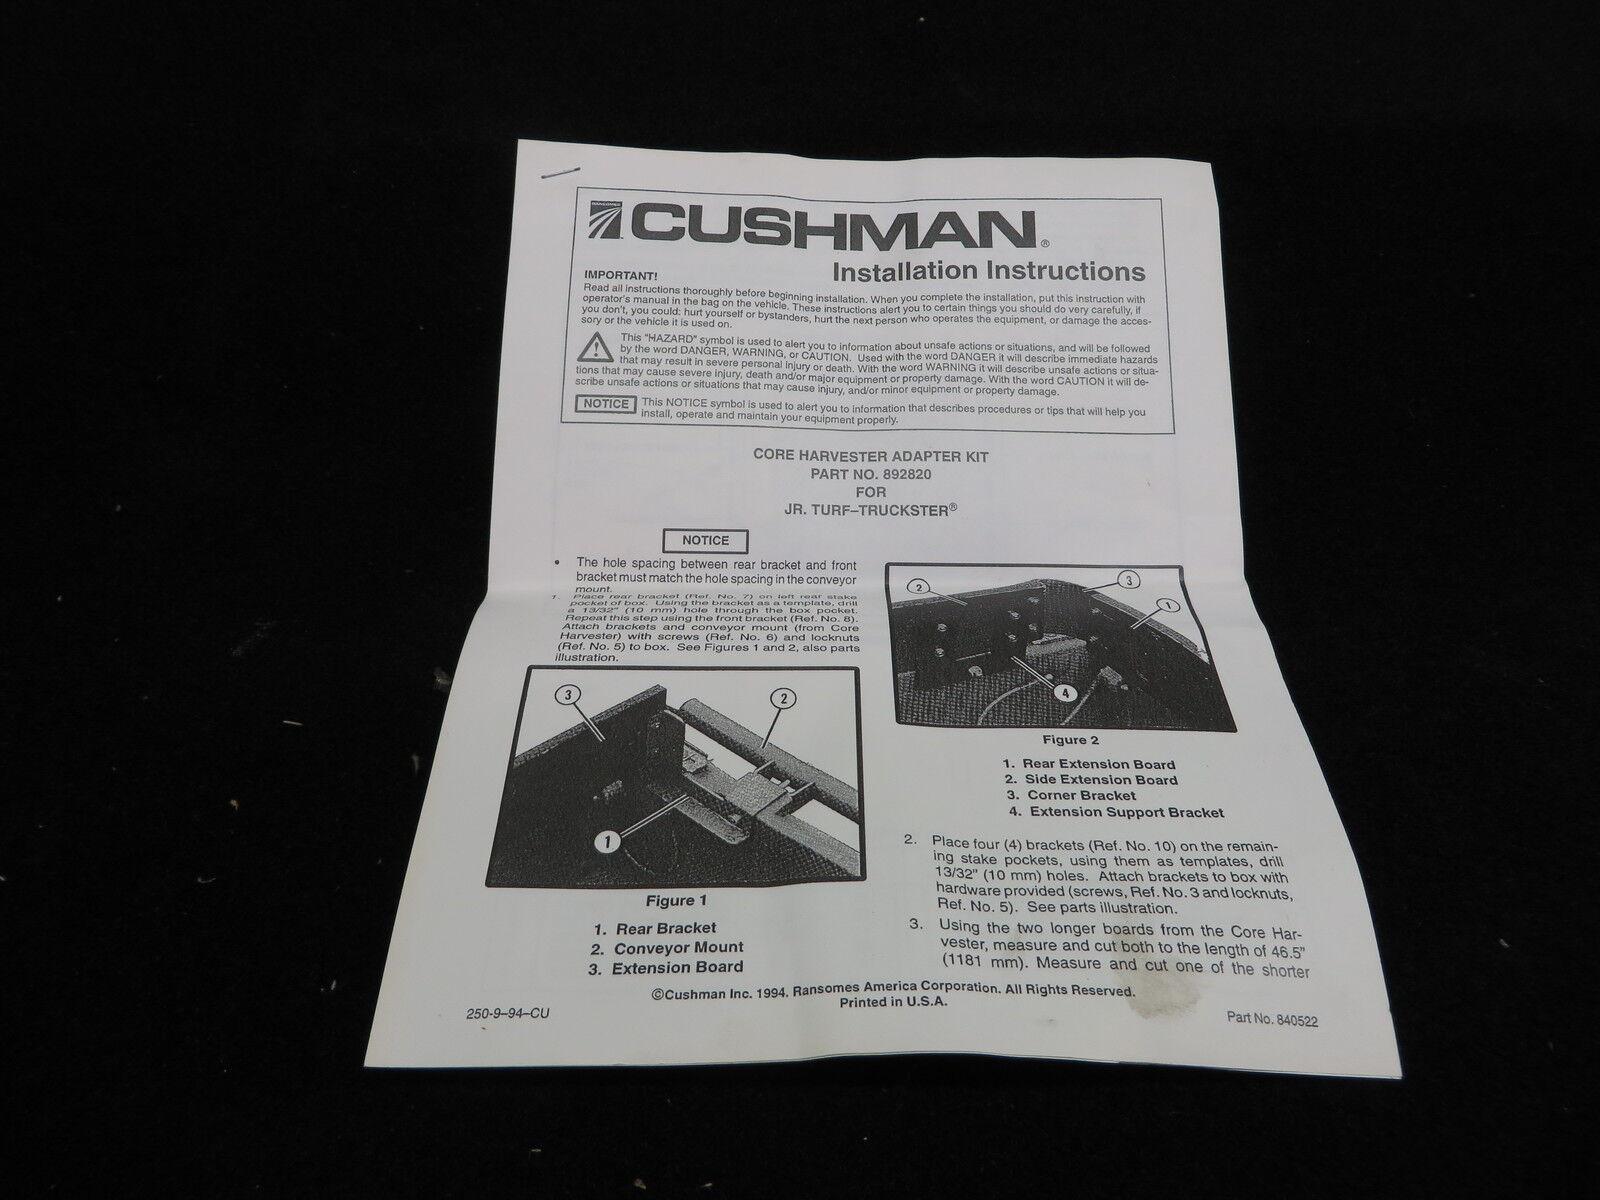 Jacobsen Truckster Wiring Diagram Golf Cart Cab Cushman Part 892820 Ryan Core Harvester Adaptor On